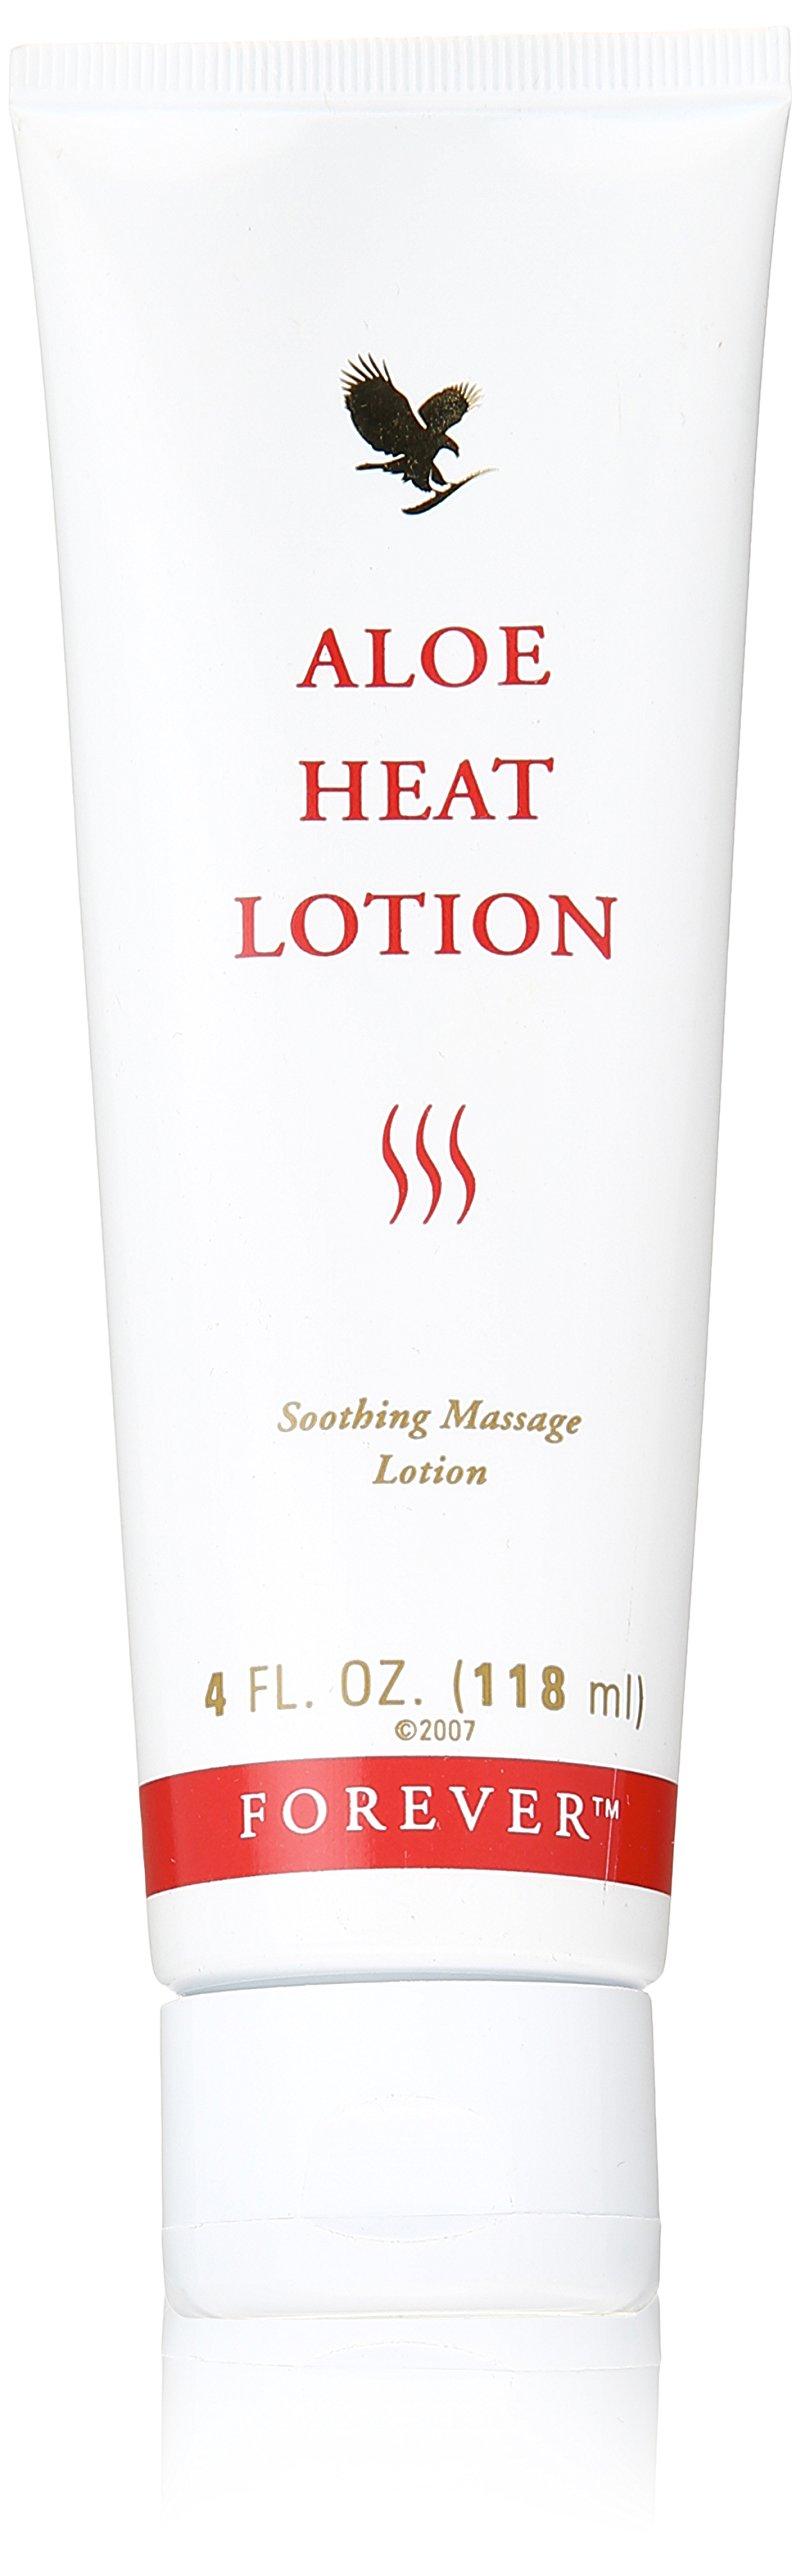 Aloe Heat Lotion (6 Pack)